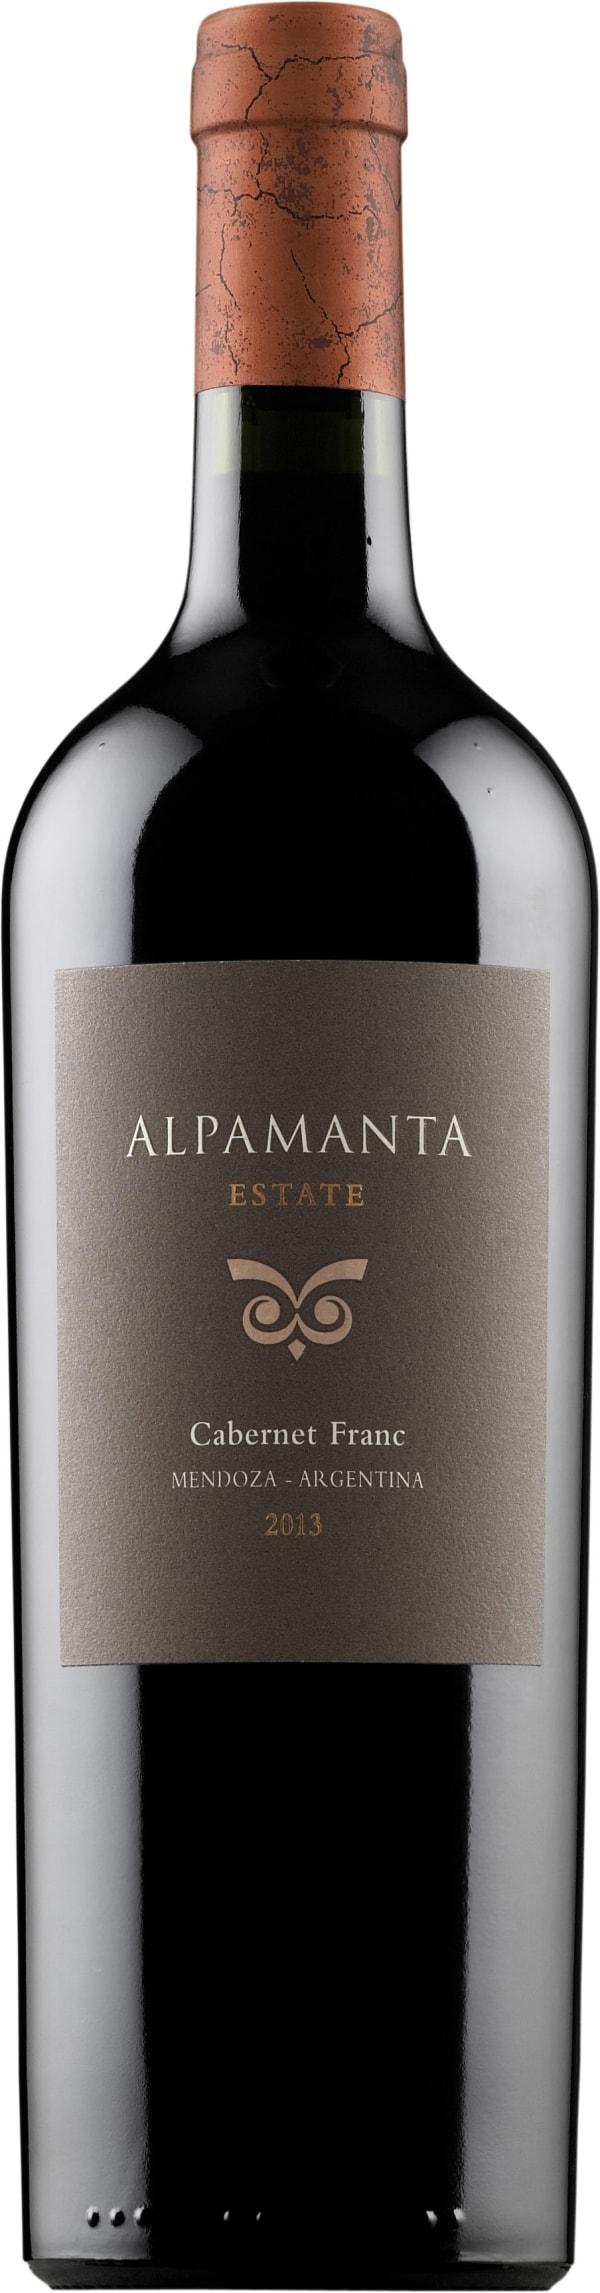 Alpamanta Estate Cabernet Franc 2013